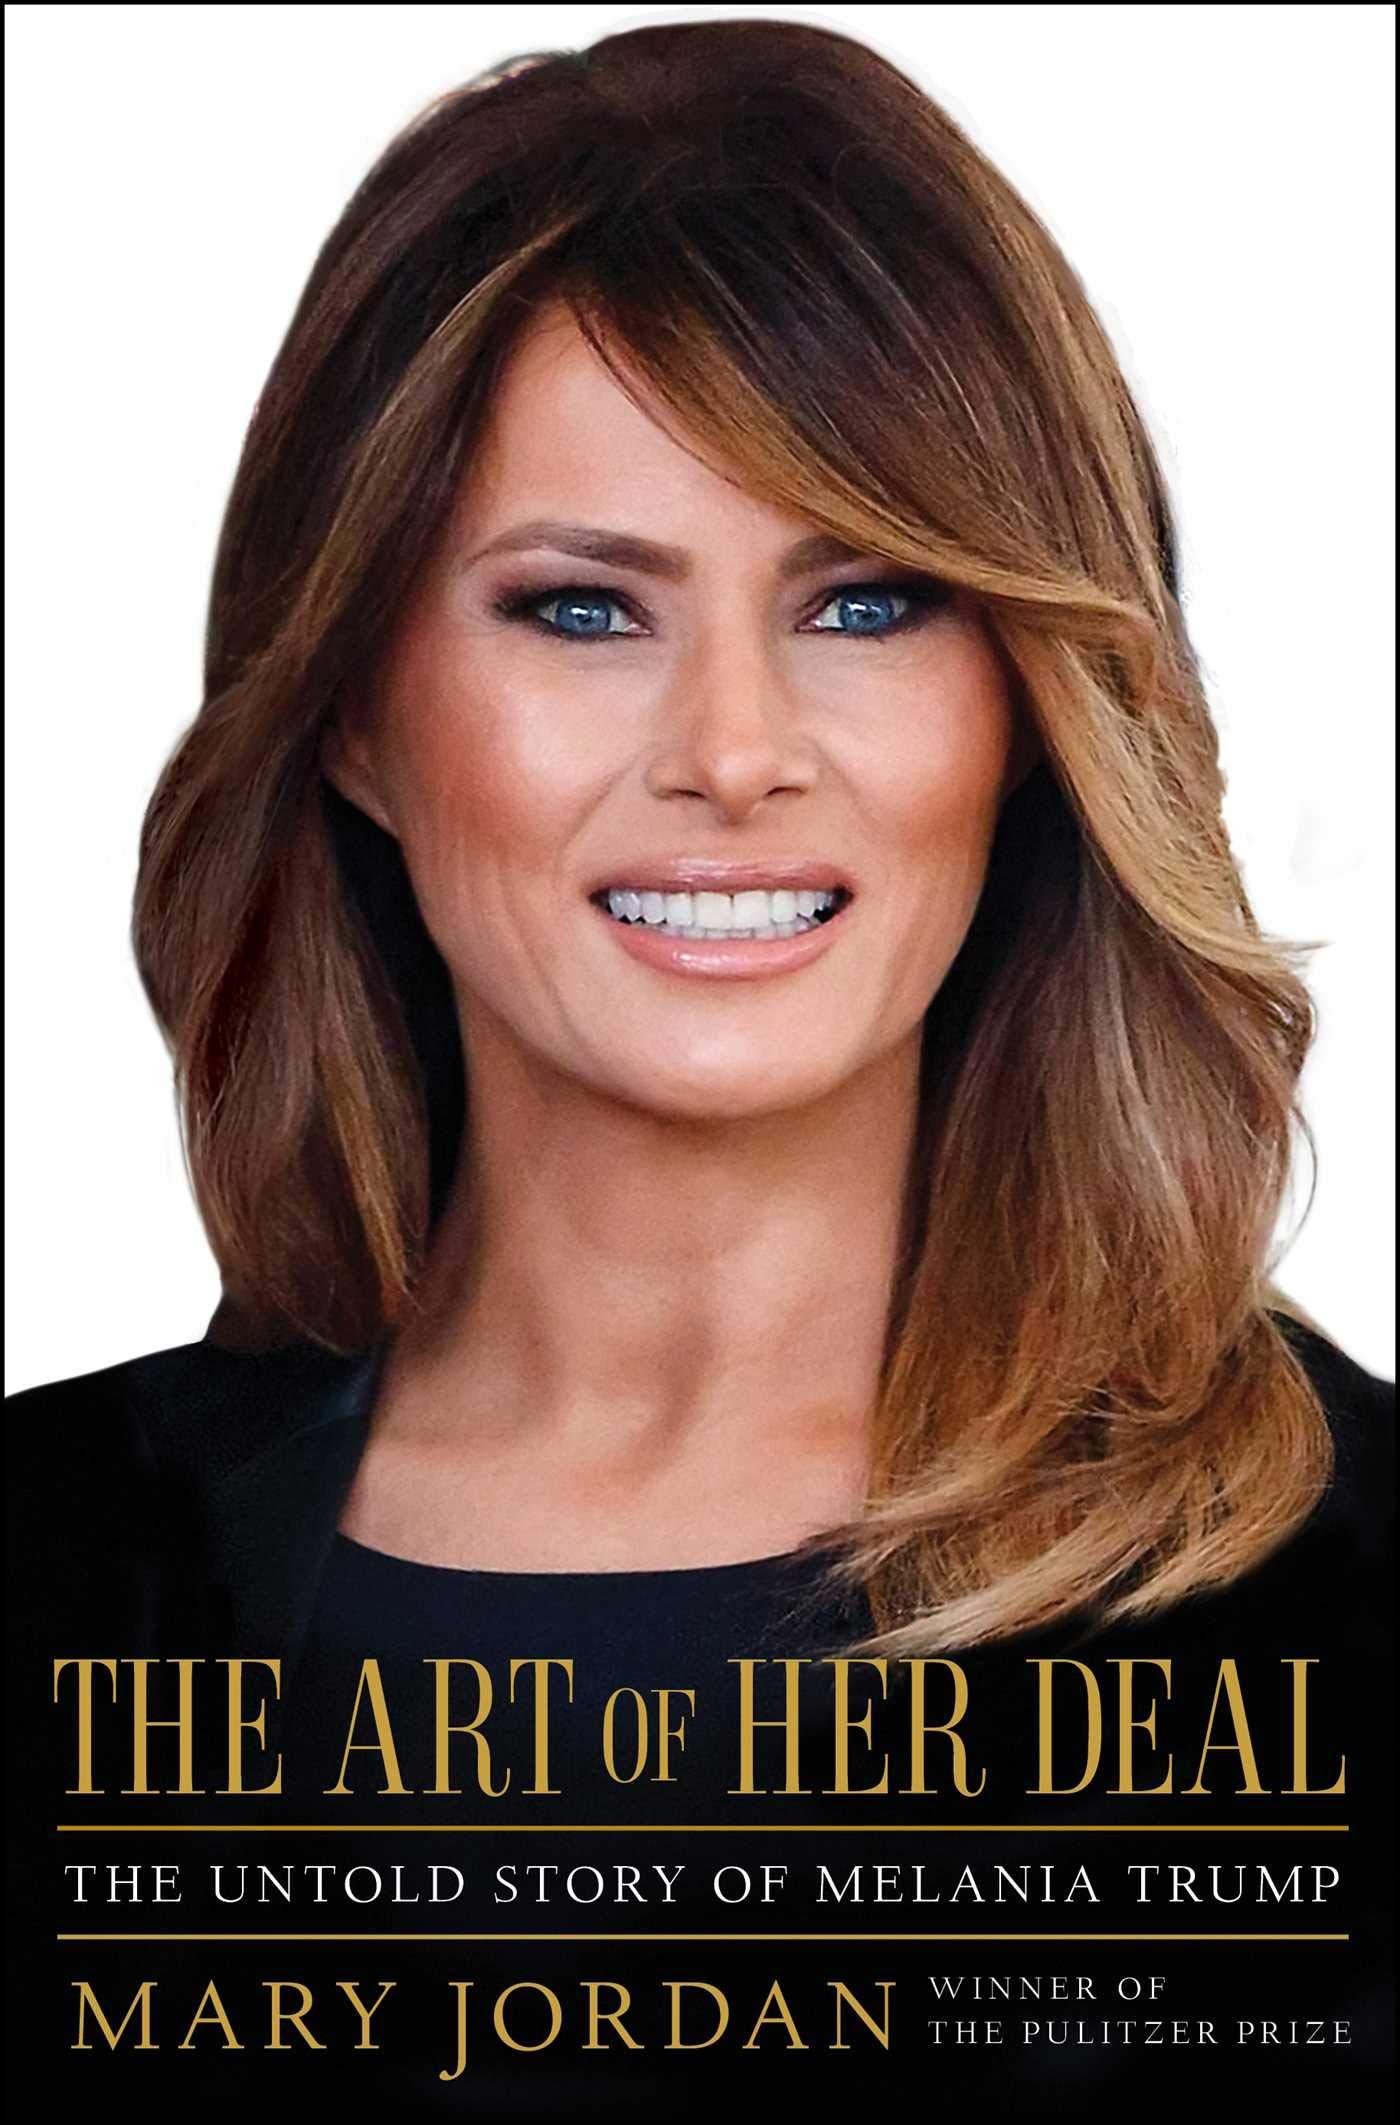 The Art of Her Deal: The Untold Story of Melania Trump AudioBook Listan Online